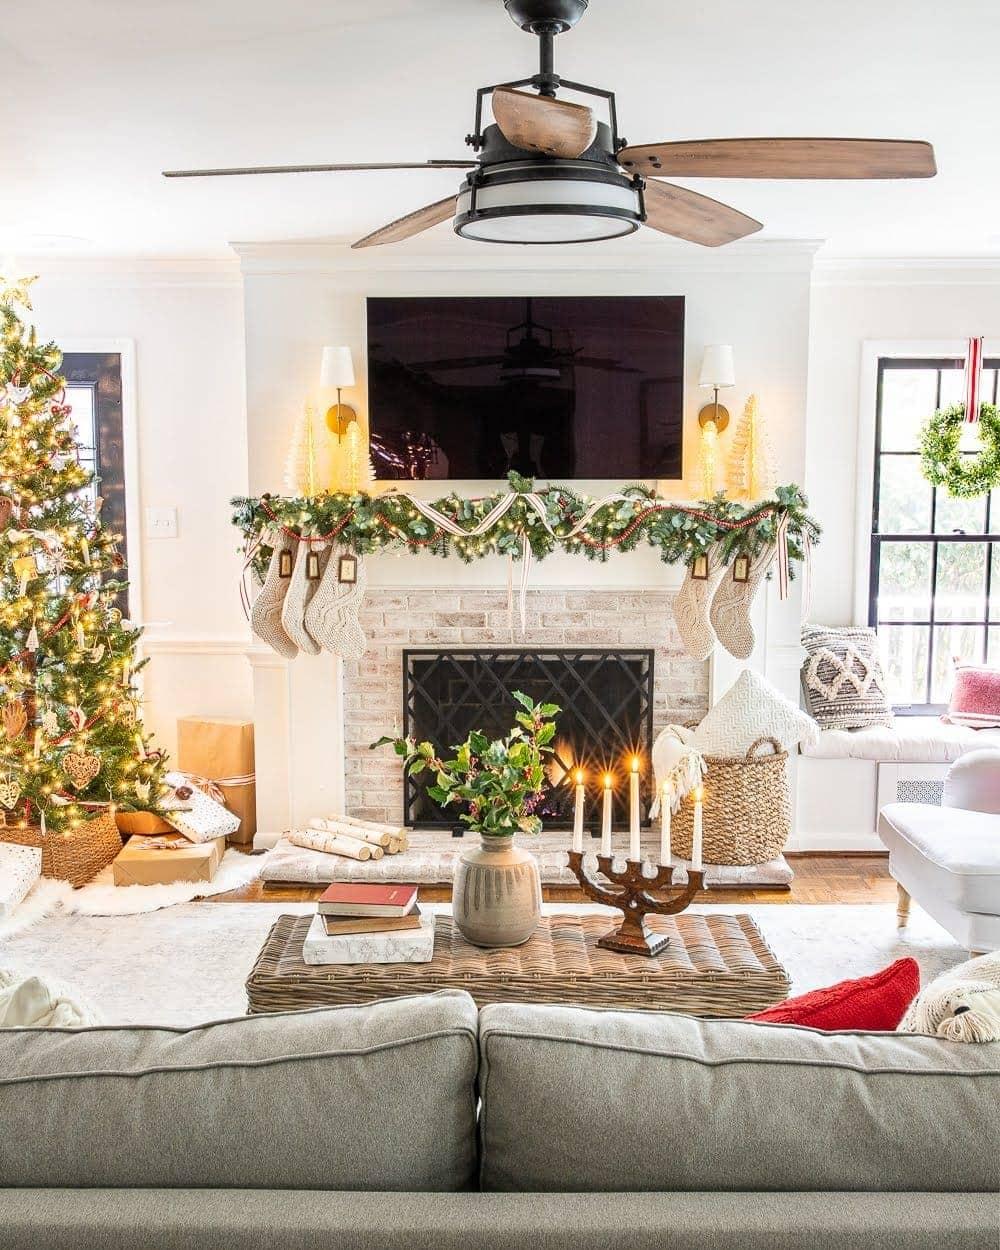 Christmas decor ideas | Christmas mantel with TV and living room